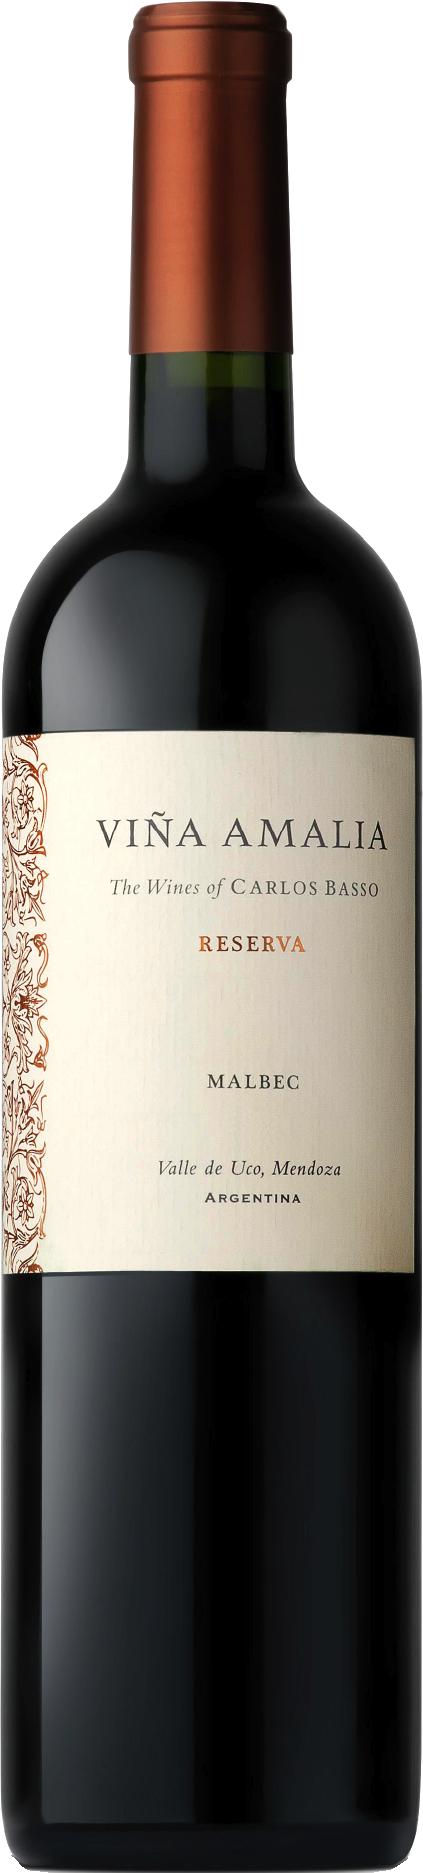 Viña Amalia Reserva Malbec